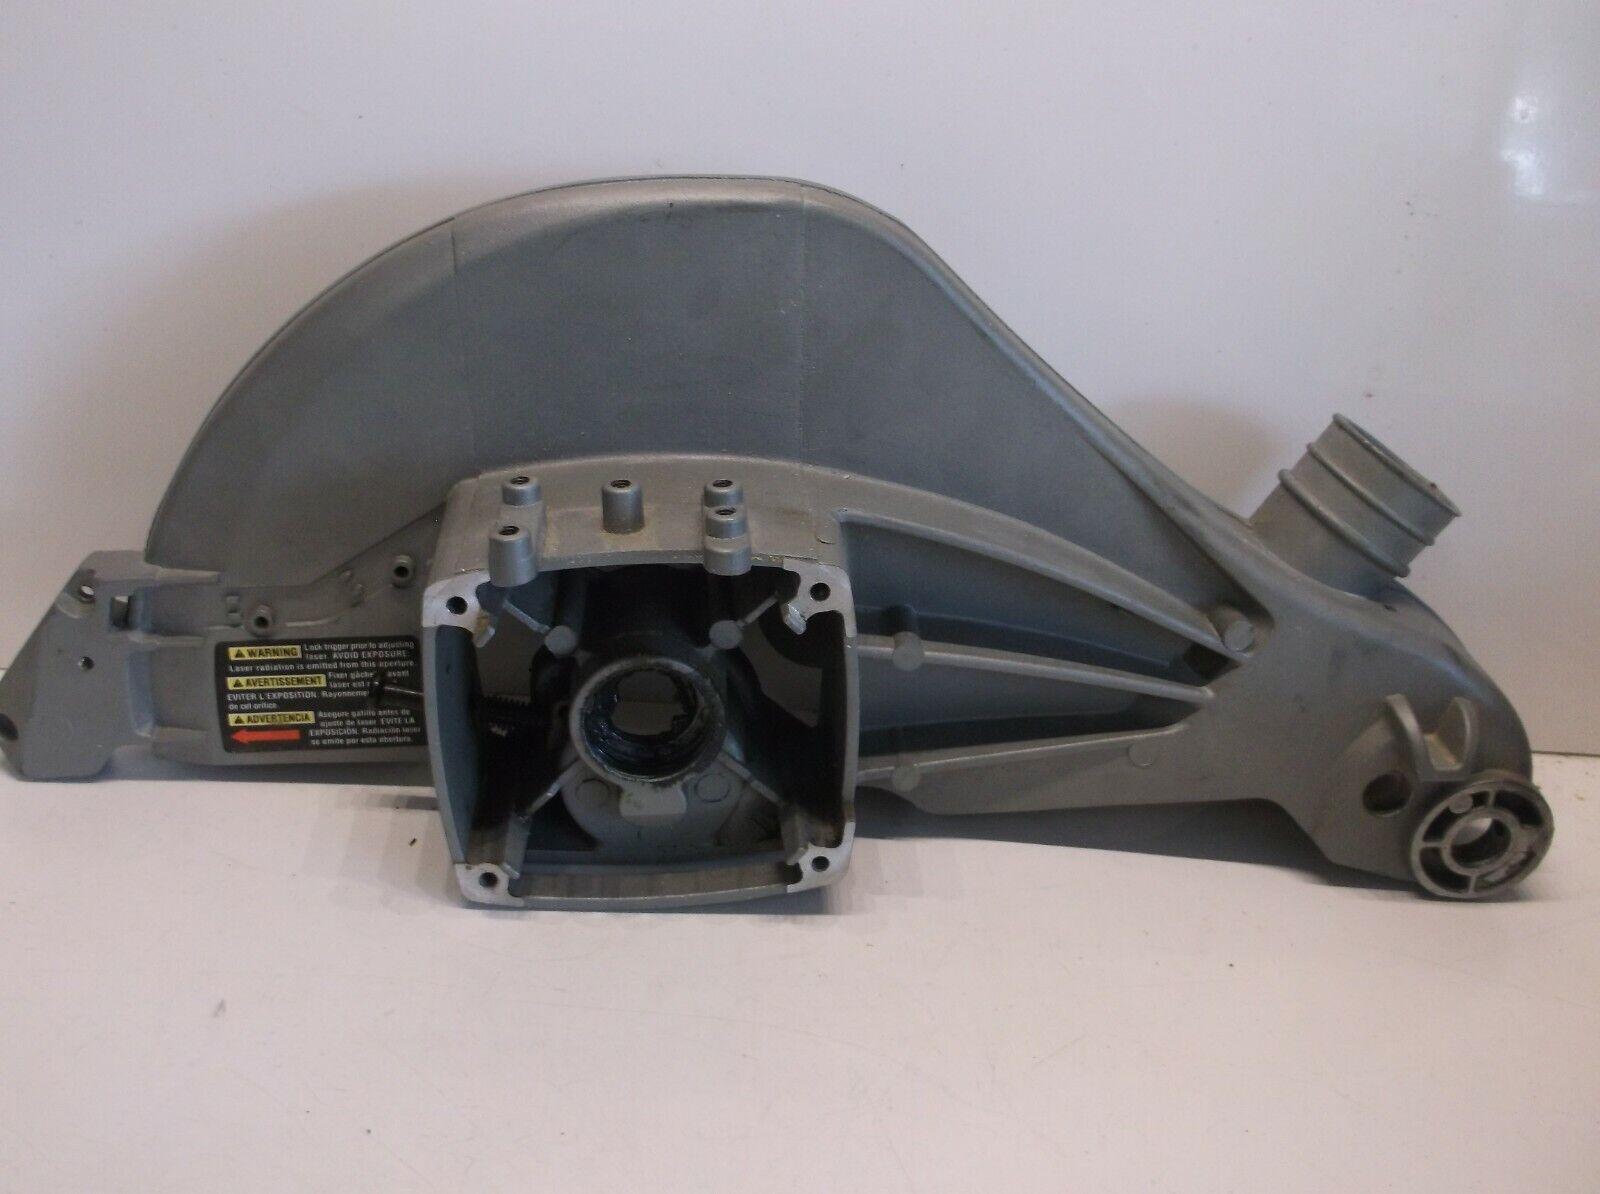 089041013702 Arm Assembly Off Of A Ryobi TS1345L 10